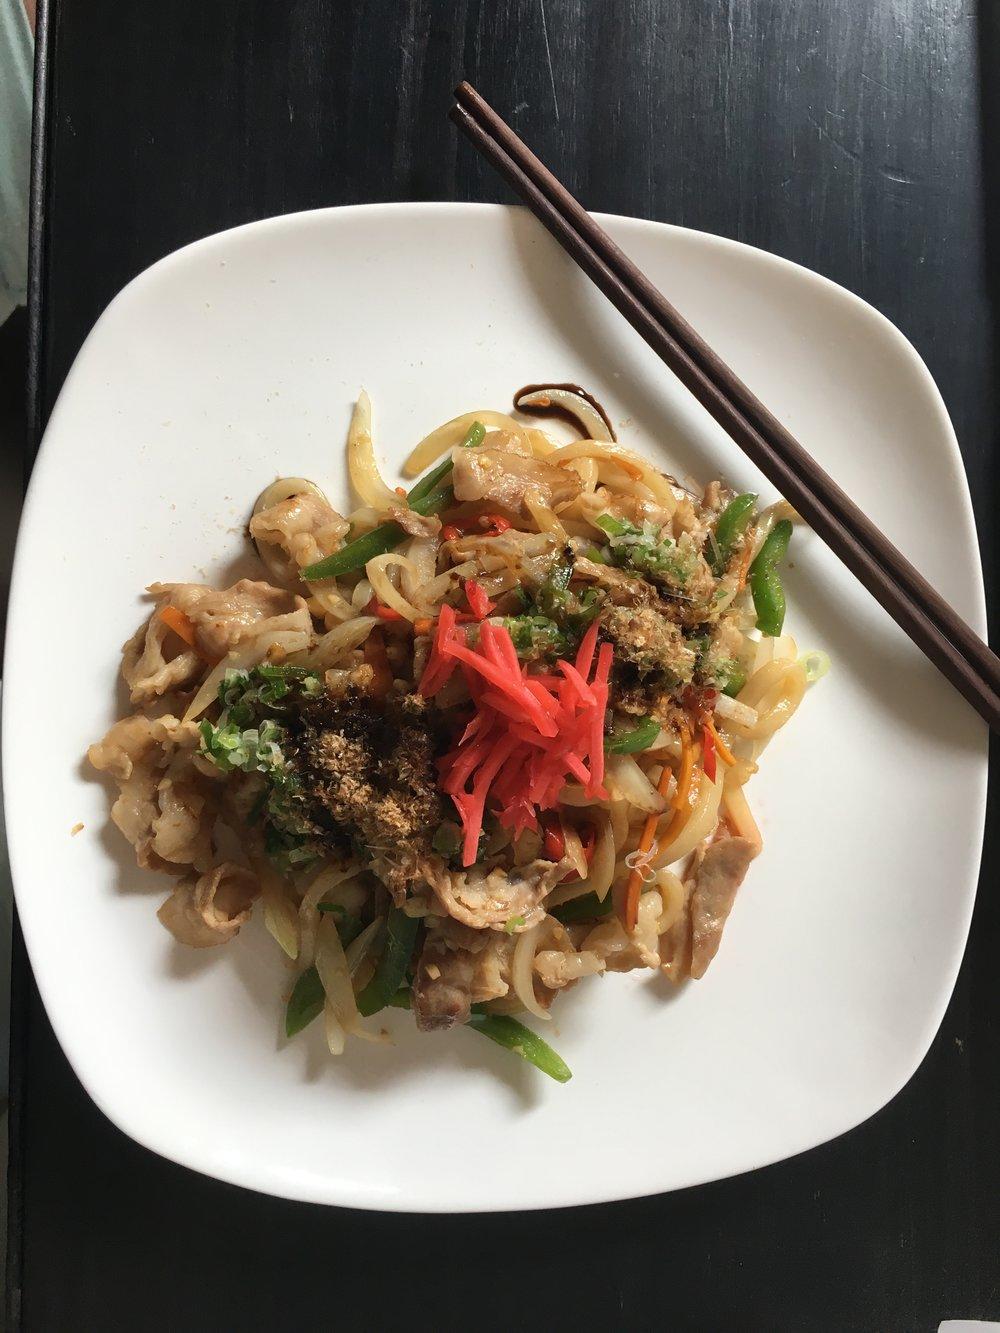 Japanese Restaurant not on the list, but tasty Yaki Udon